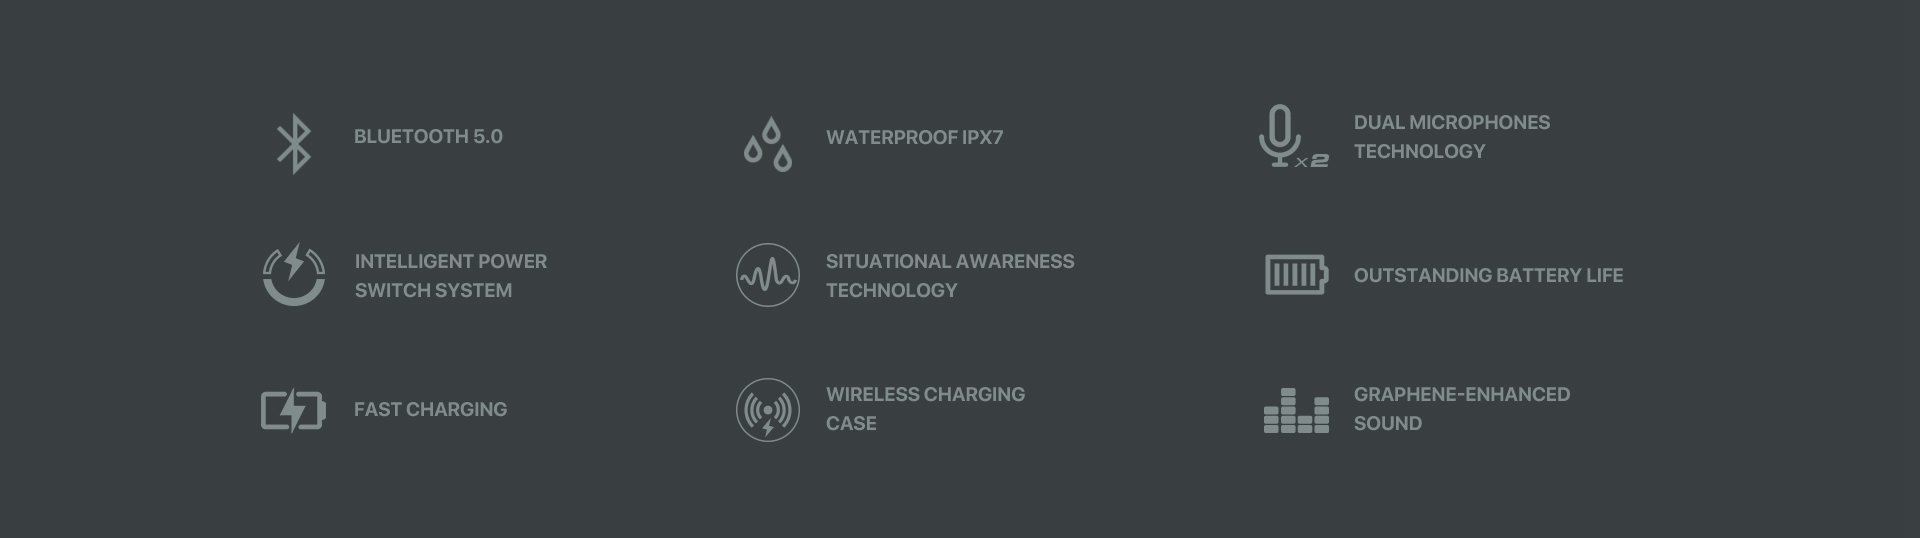 Jabees Firefly 2 Black Touch TWS Earbuds Waterproof & Dustproof IPX7 2